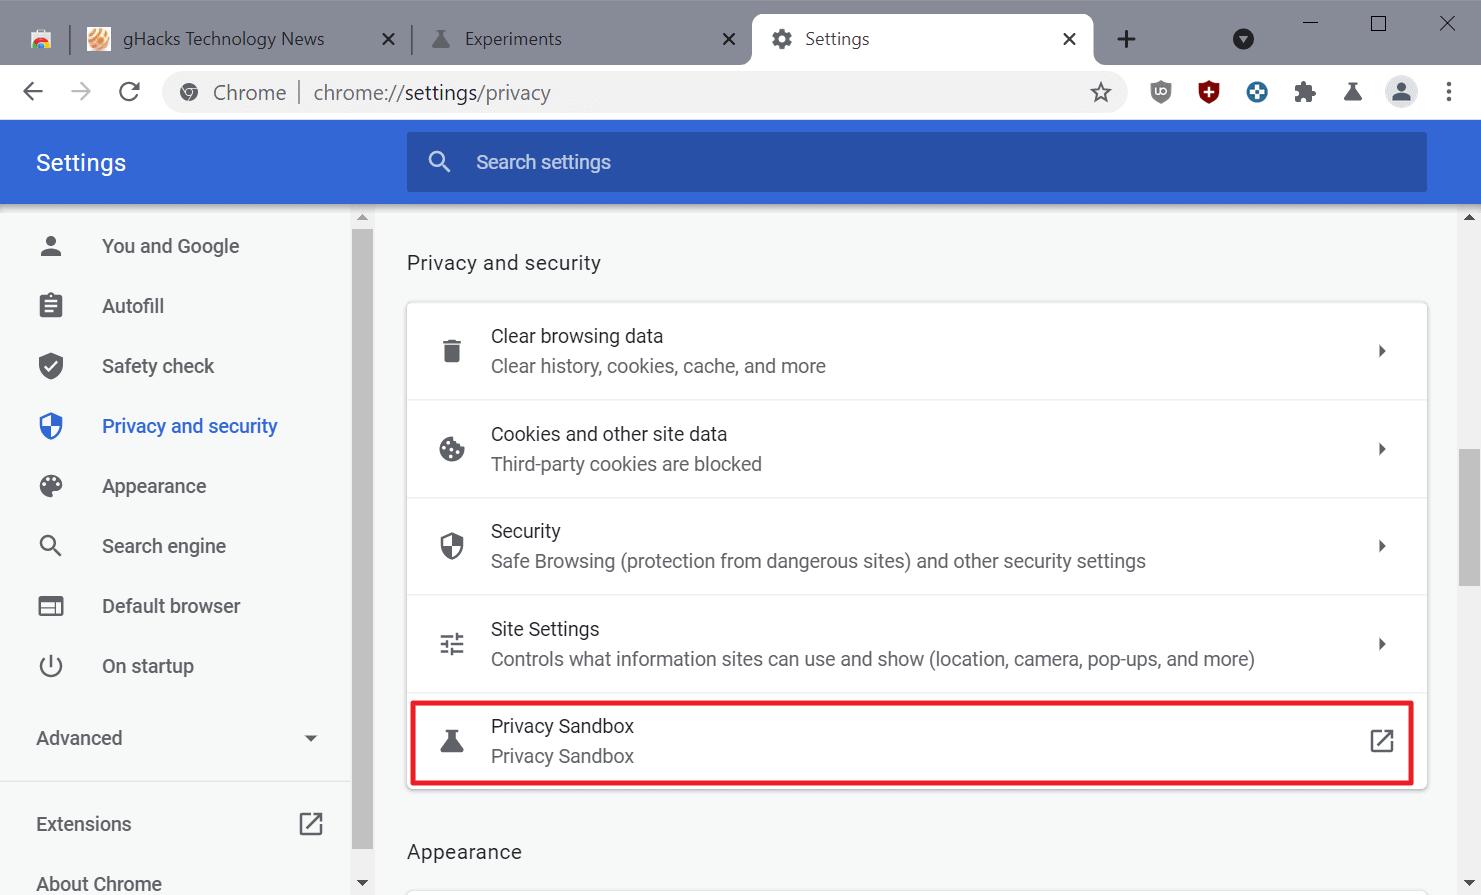 chrome-privacy sandbox settings